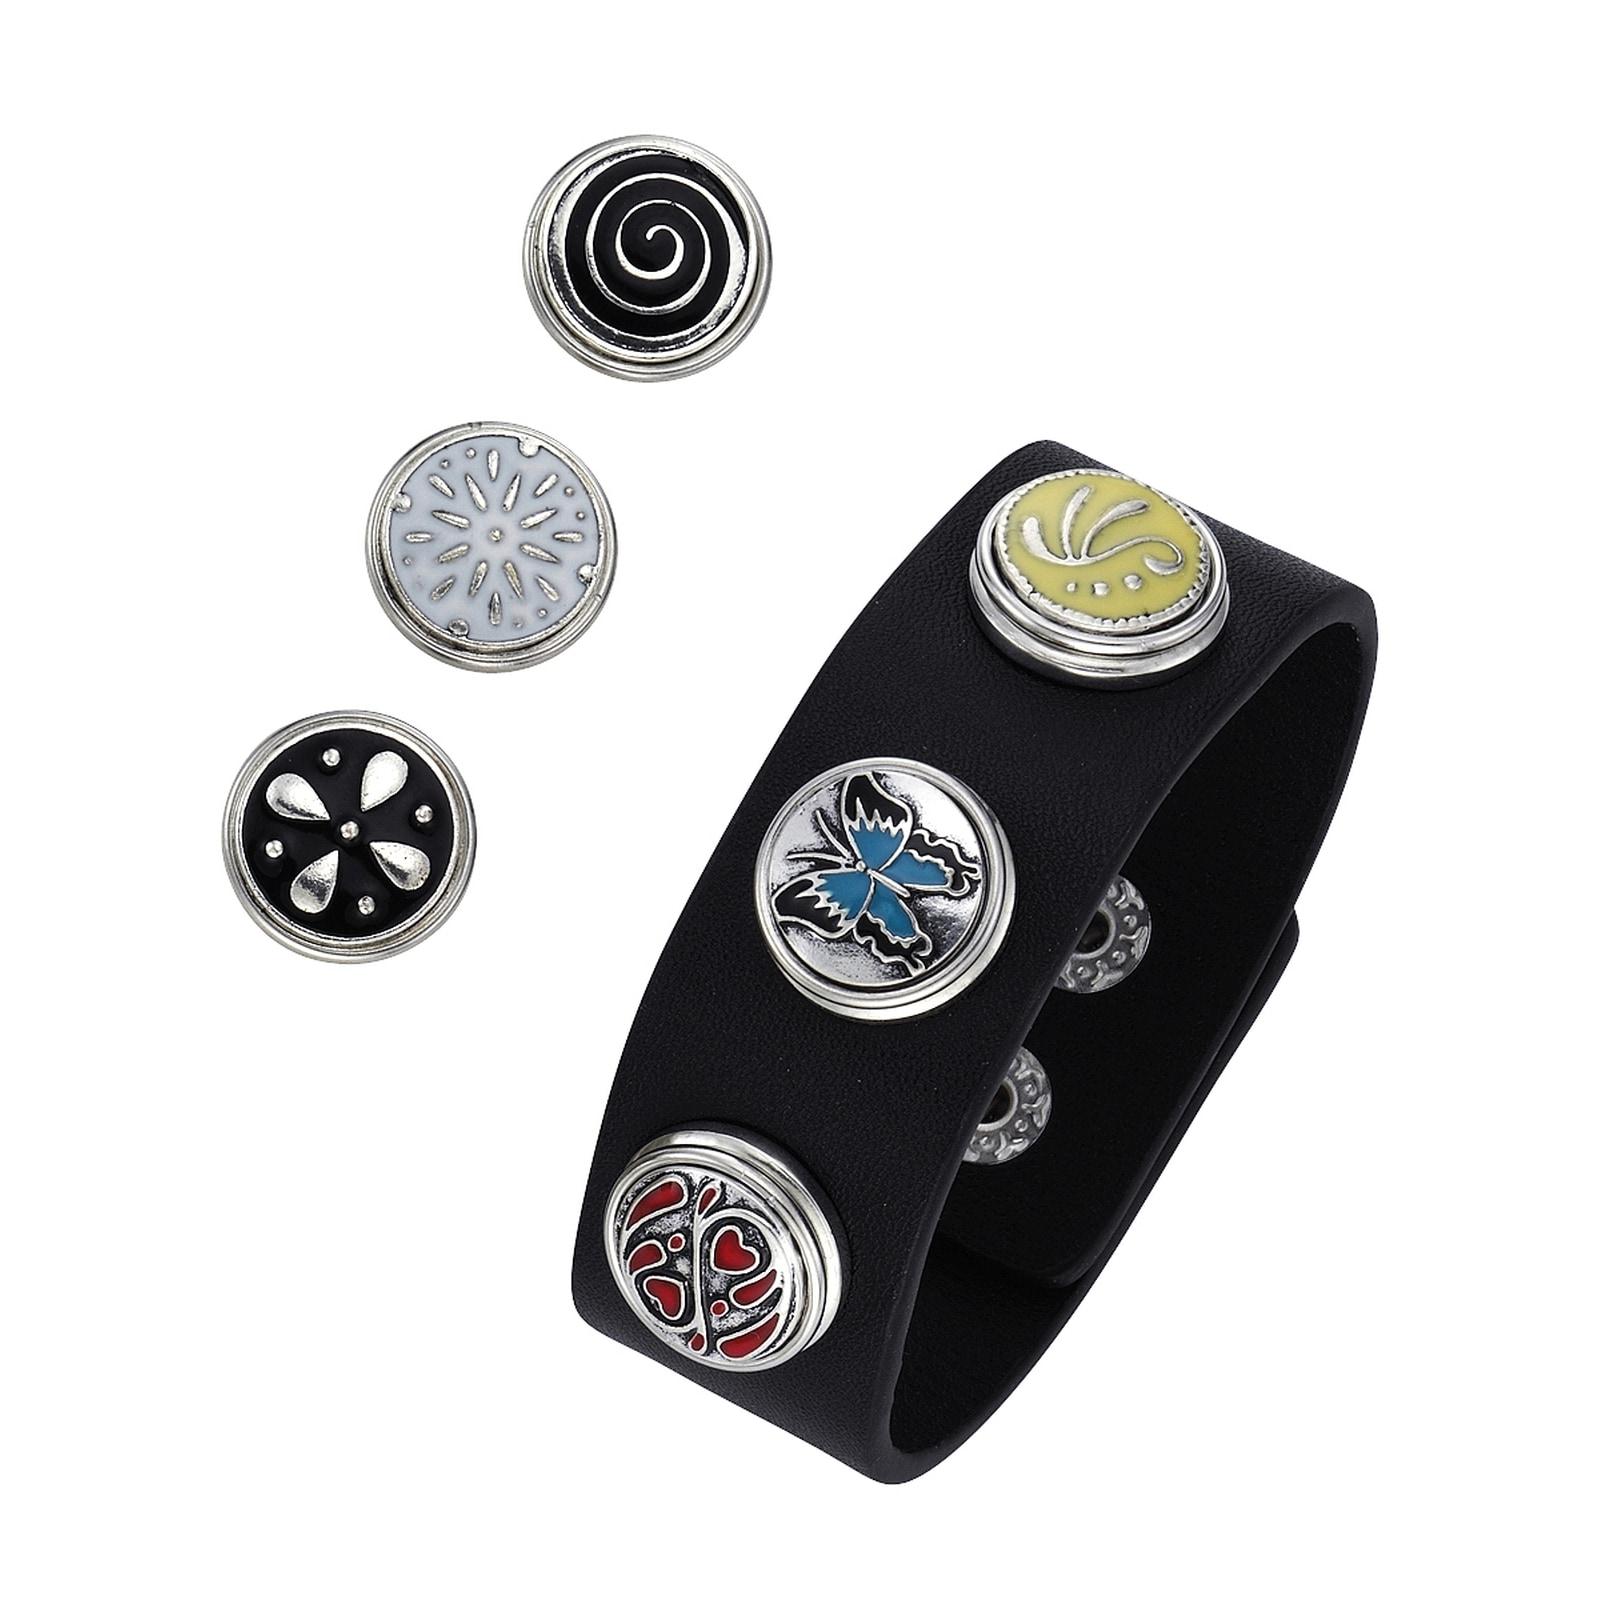 Jacques Charrel Armband Kunstlederarmband mit Druckknöpfen, Metall bunt Damen Armbänder Schmuck